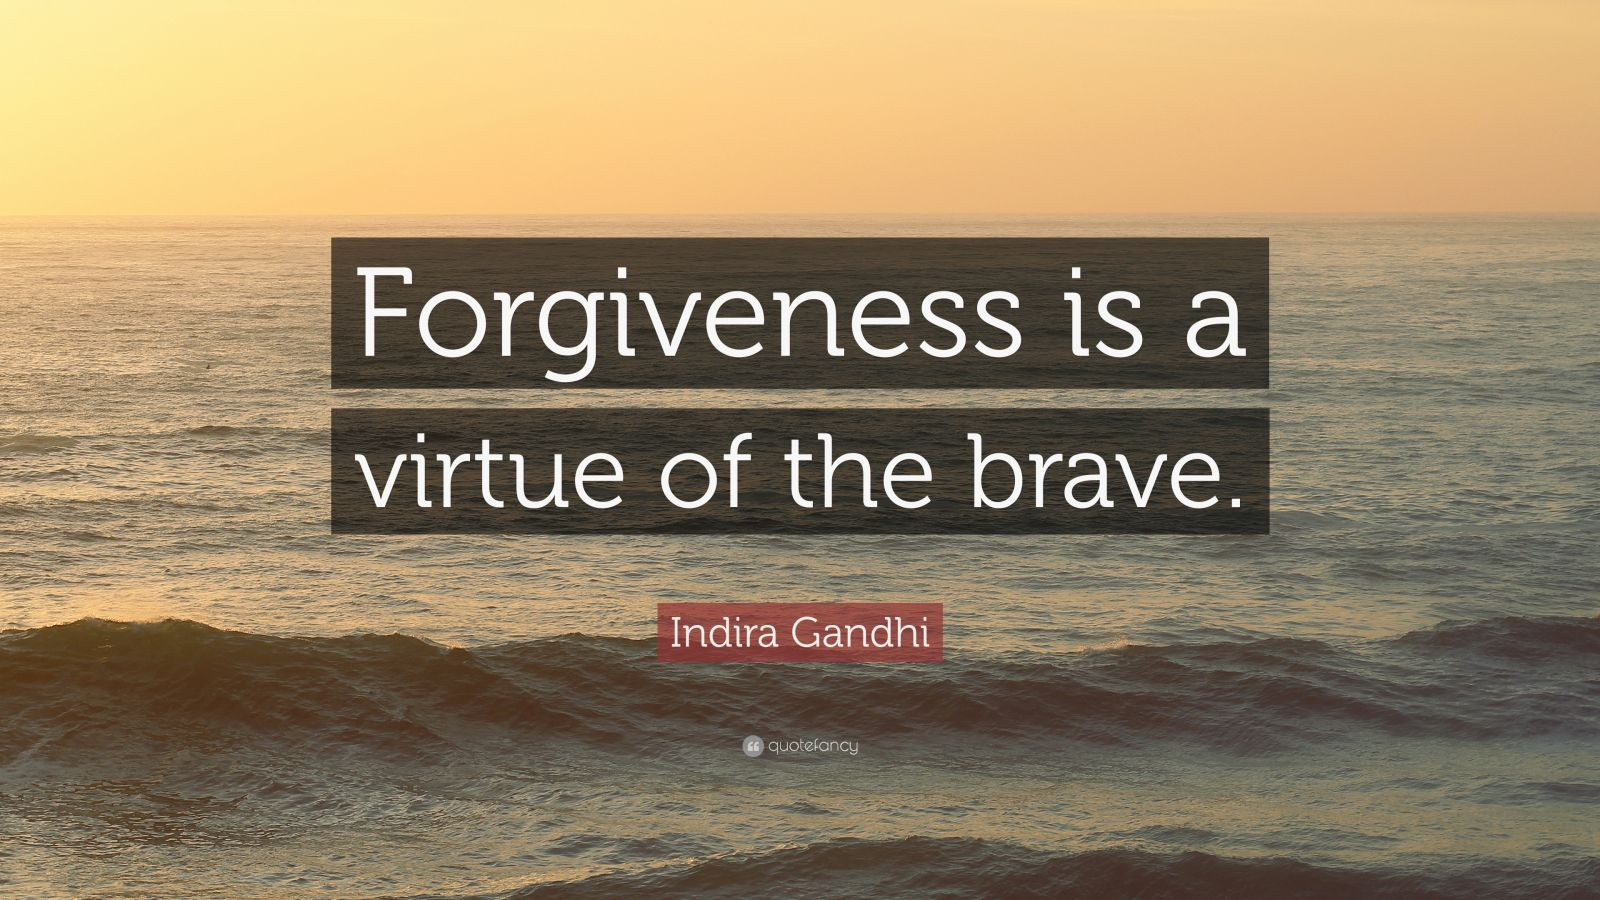 eva kors virtues of forgiveness and bravery